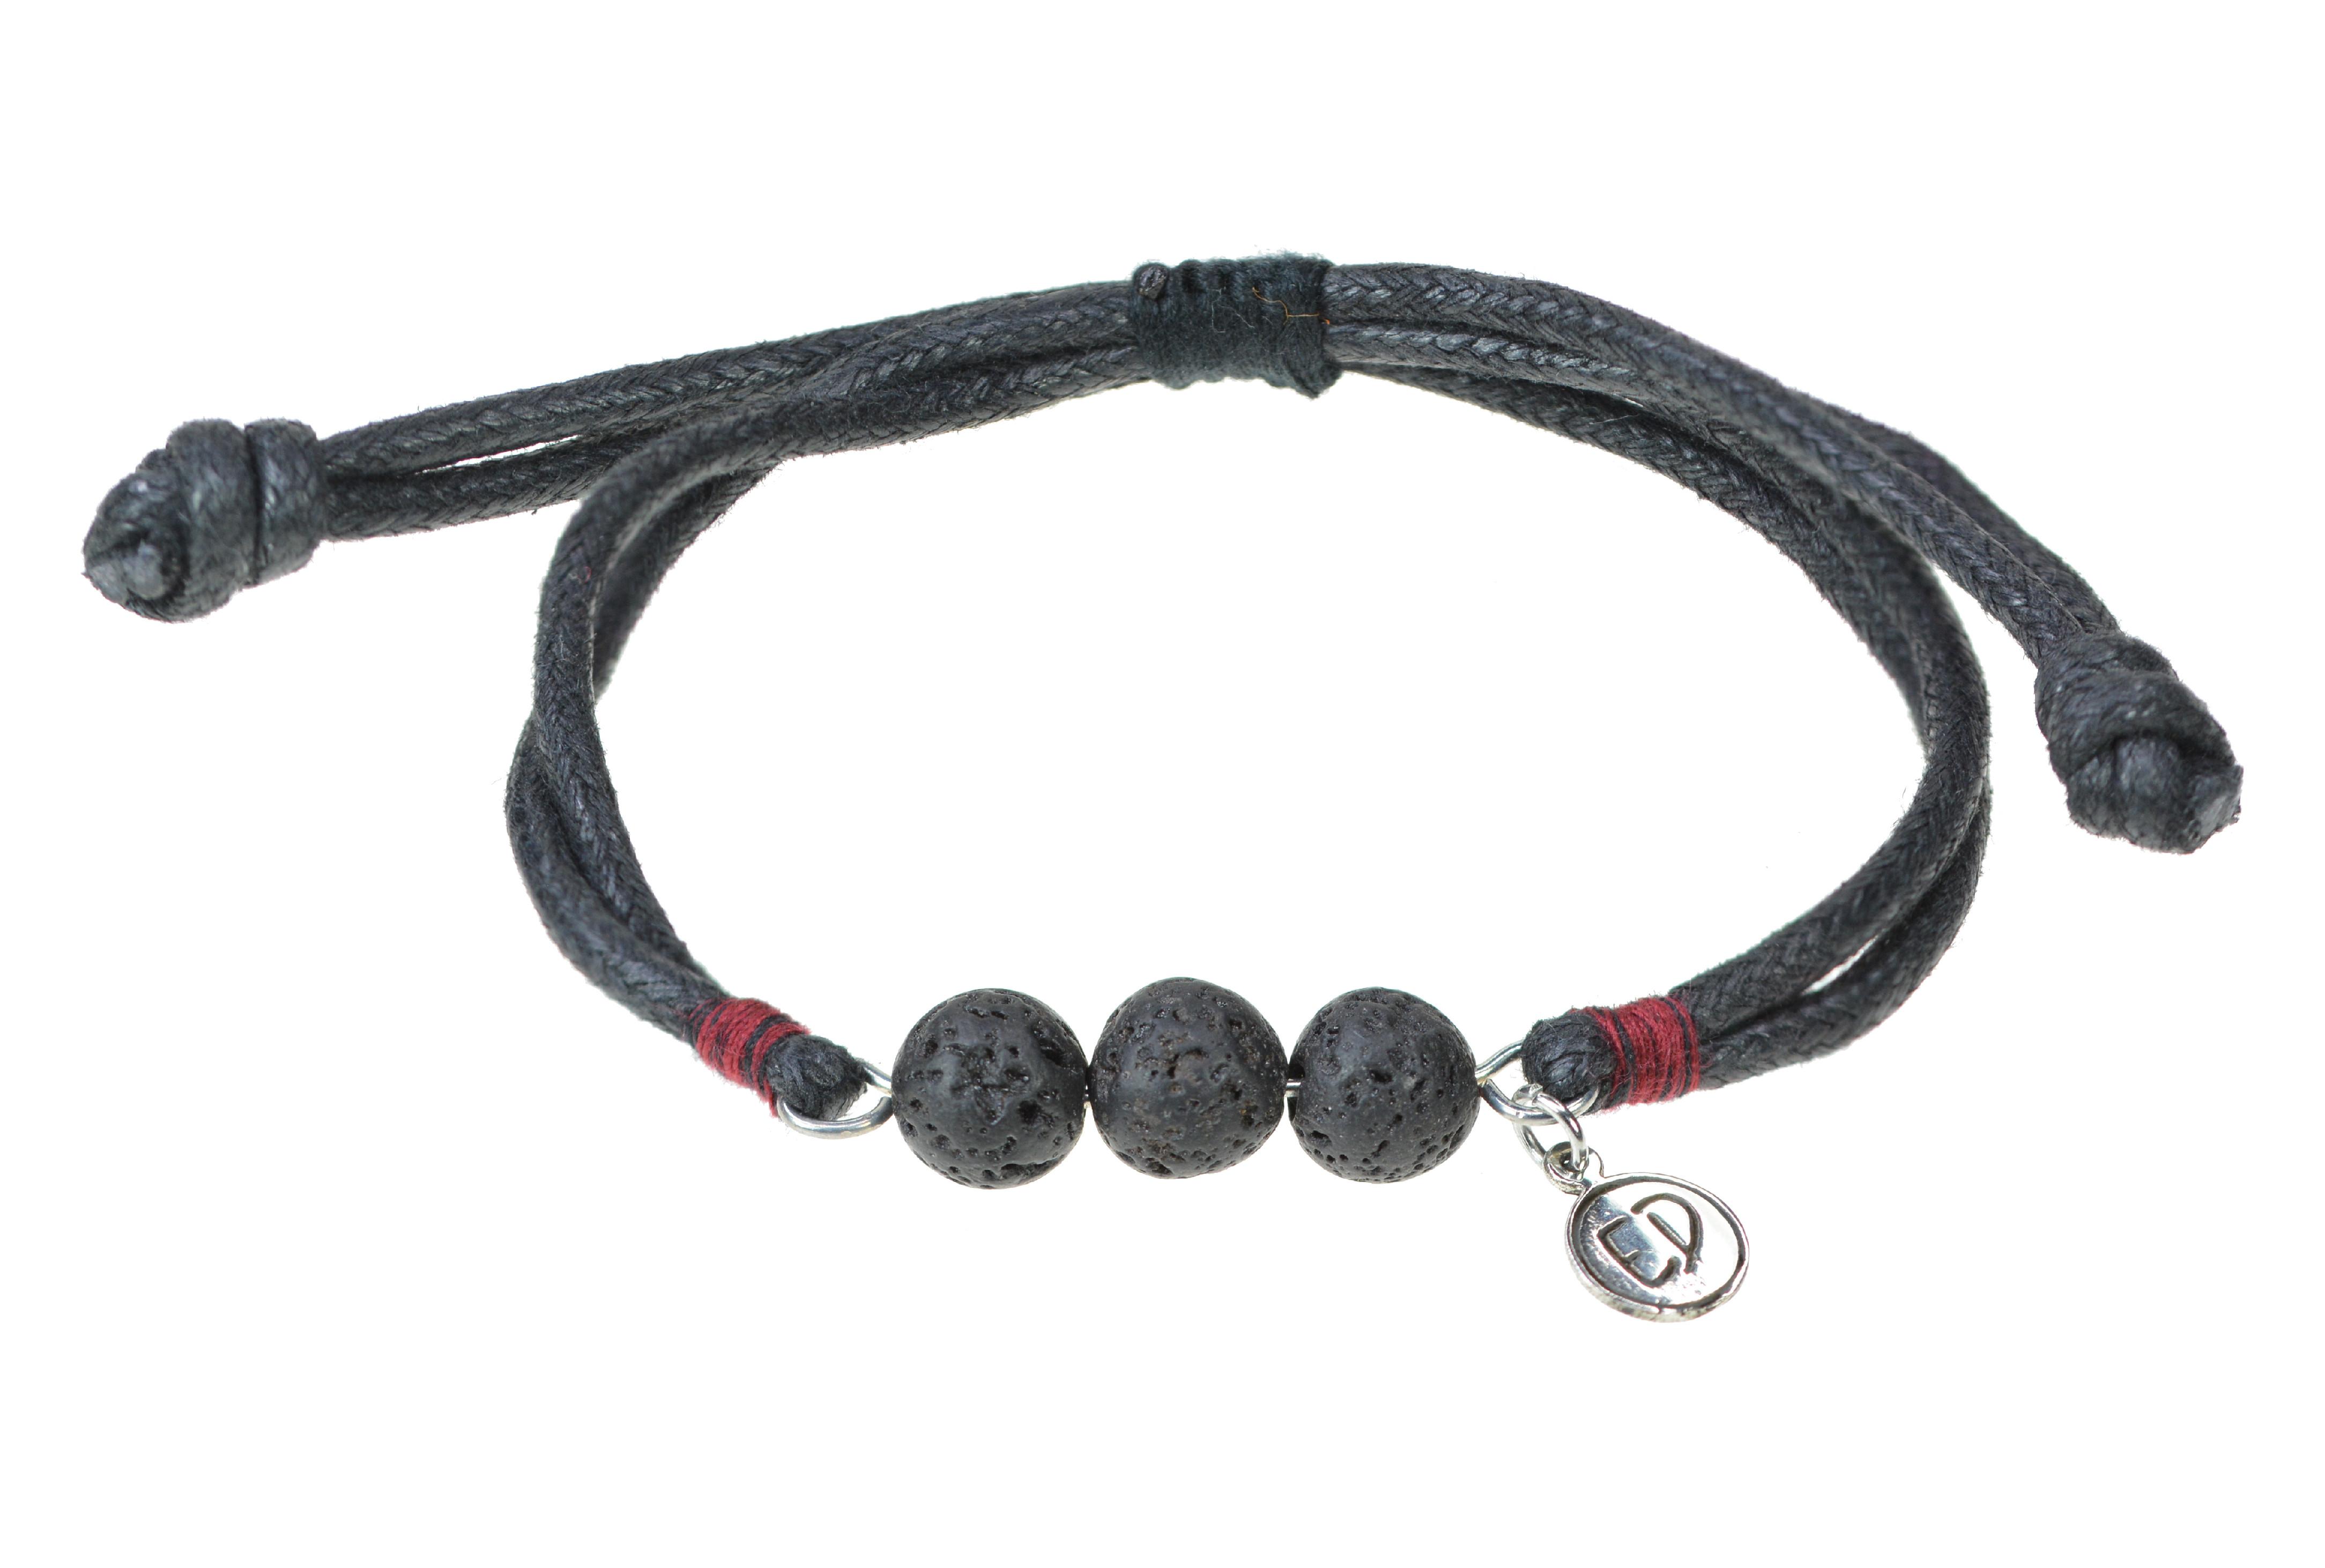 Pánsky náramok s lávovými kameňmi a červenou bavlnenou nitkou